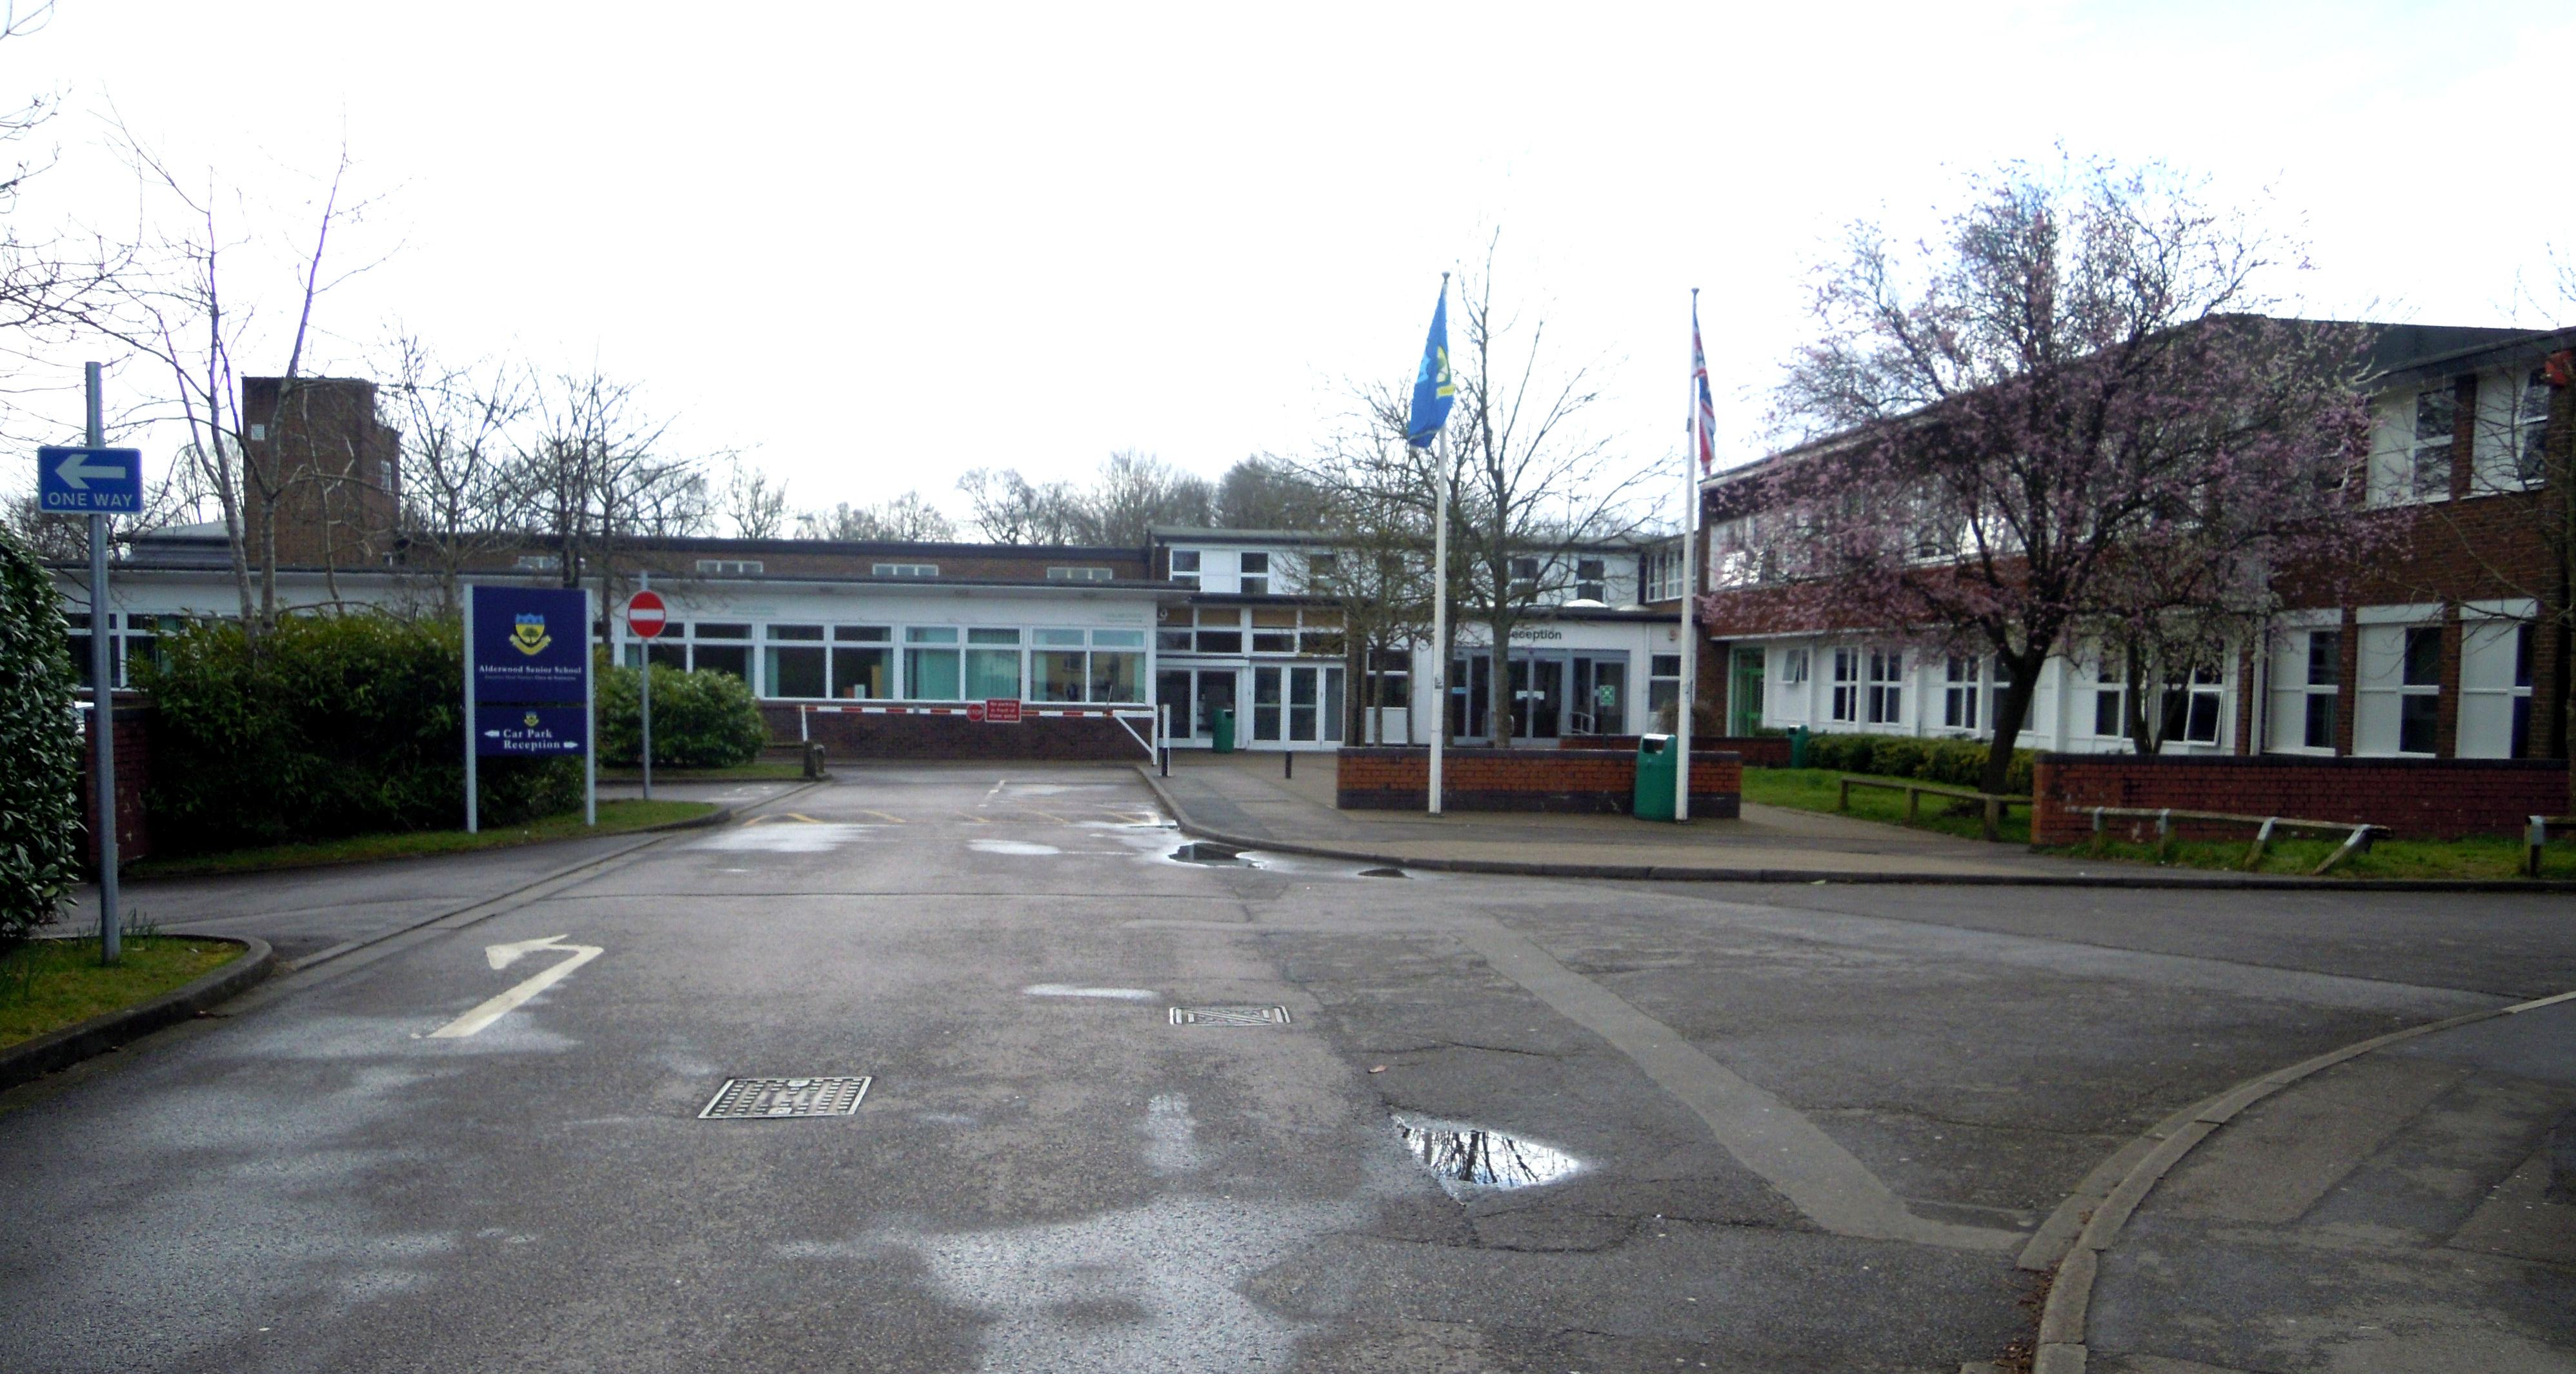 Alderwood_School_Aldershot_2018.jpg?profile=RESIZE_400x